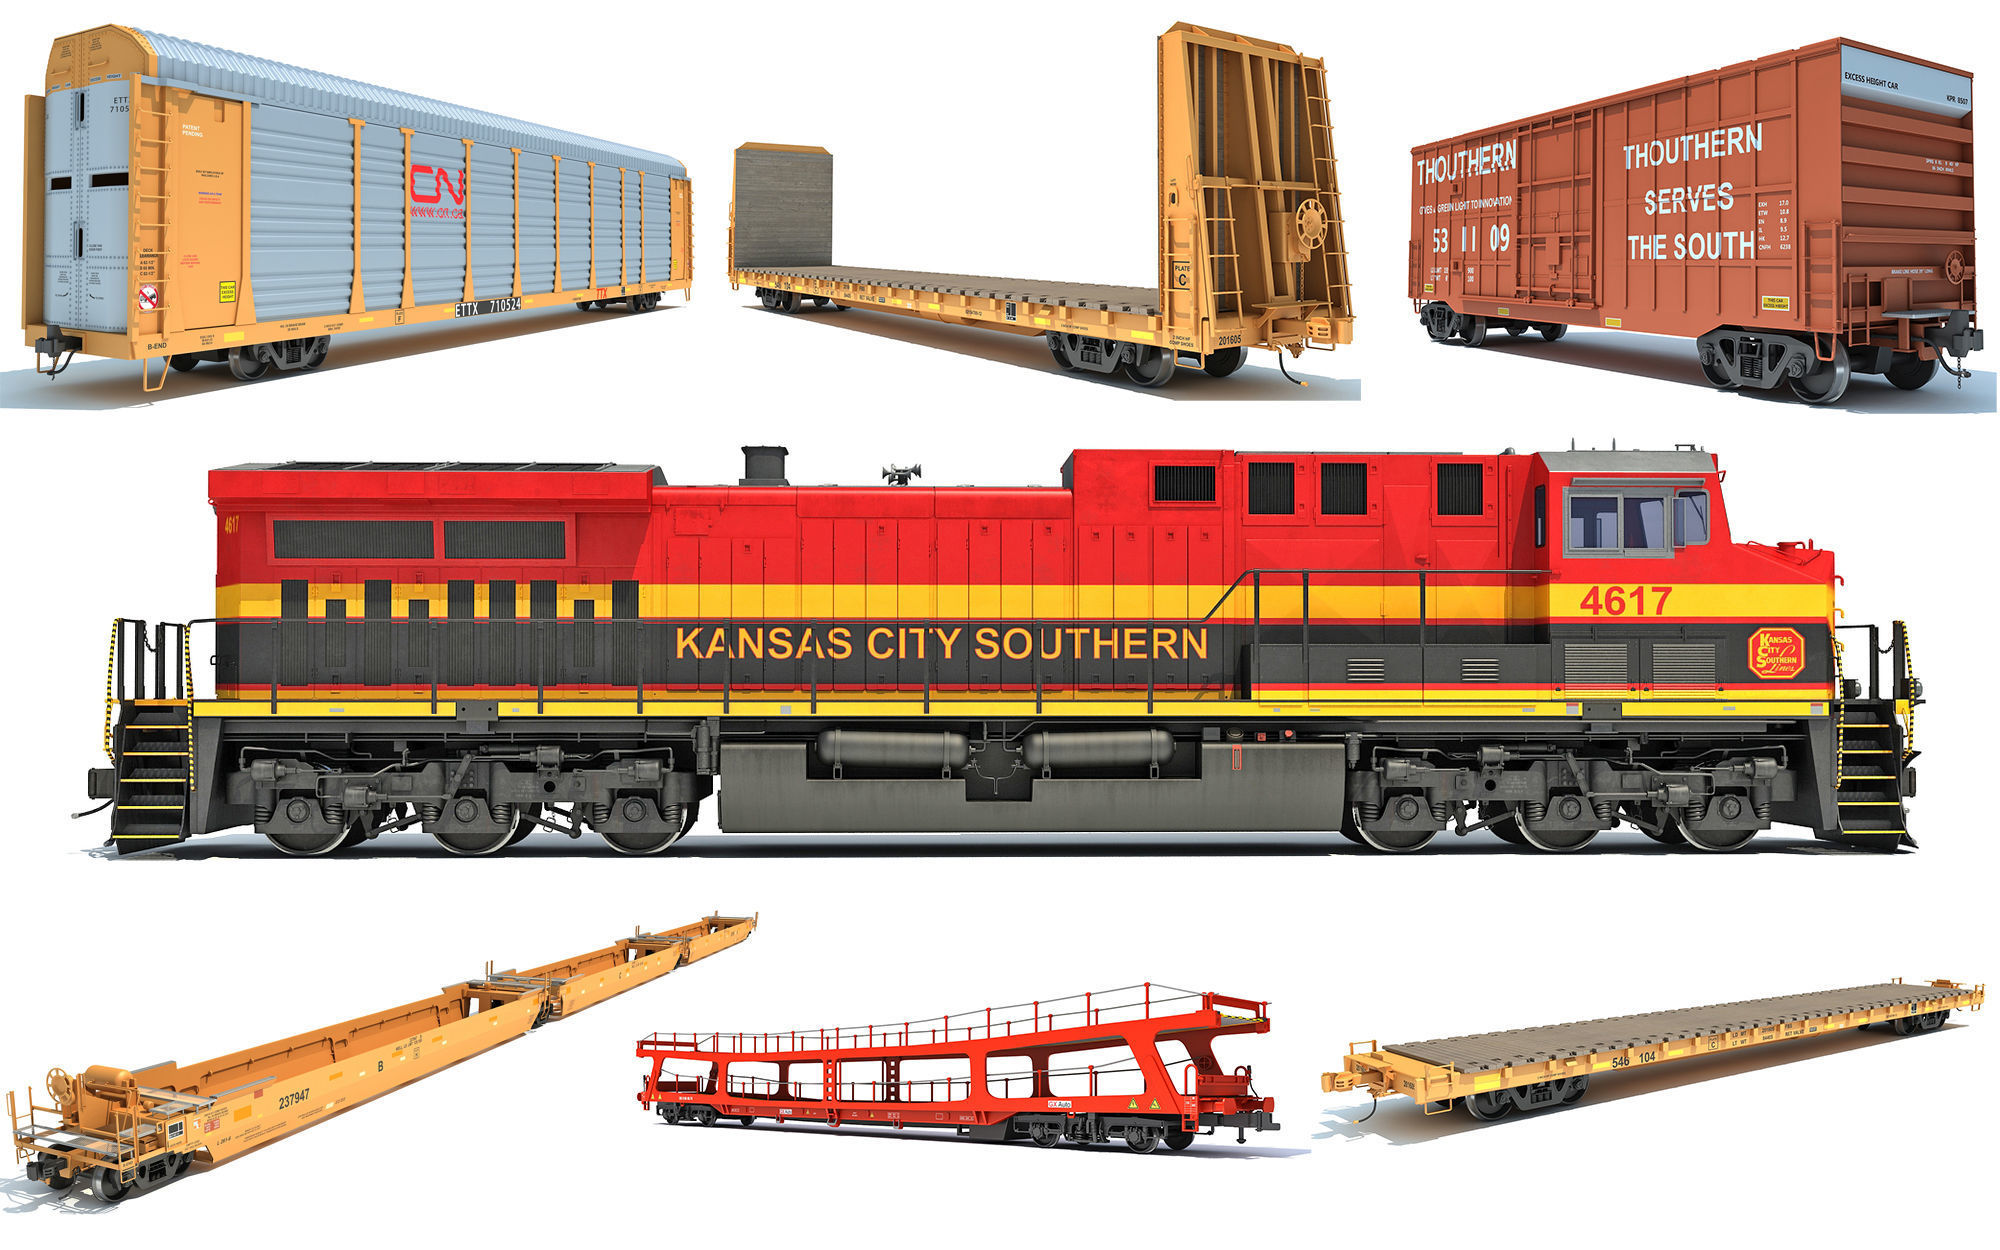 Kansas City Southern Freight Train